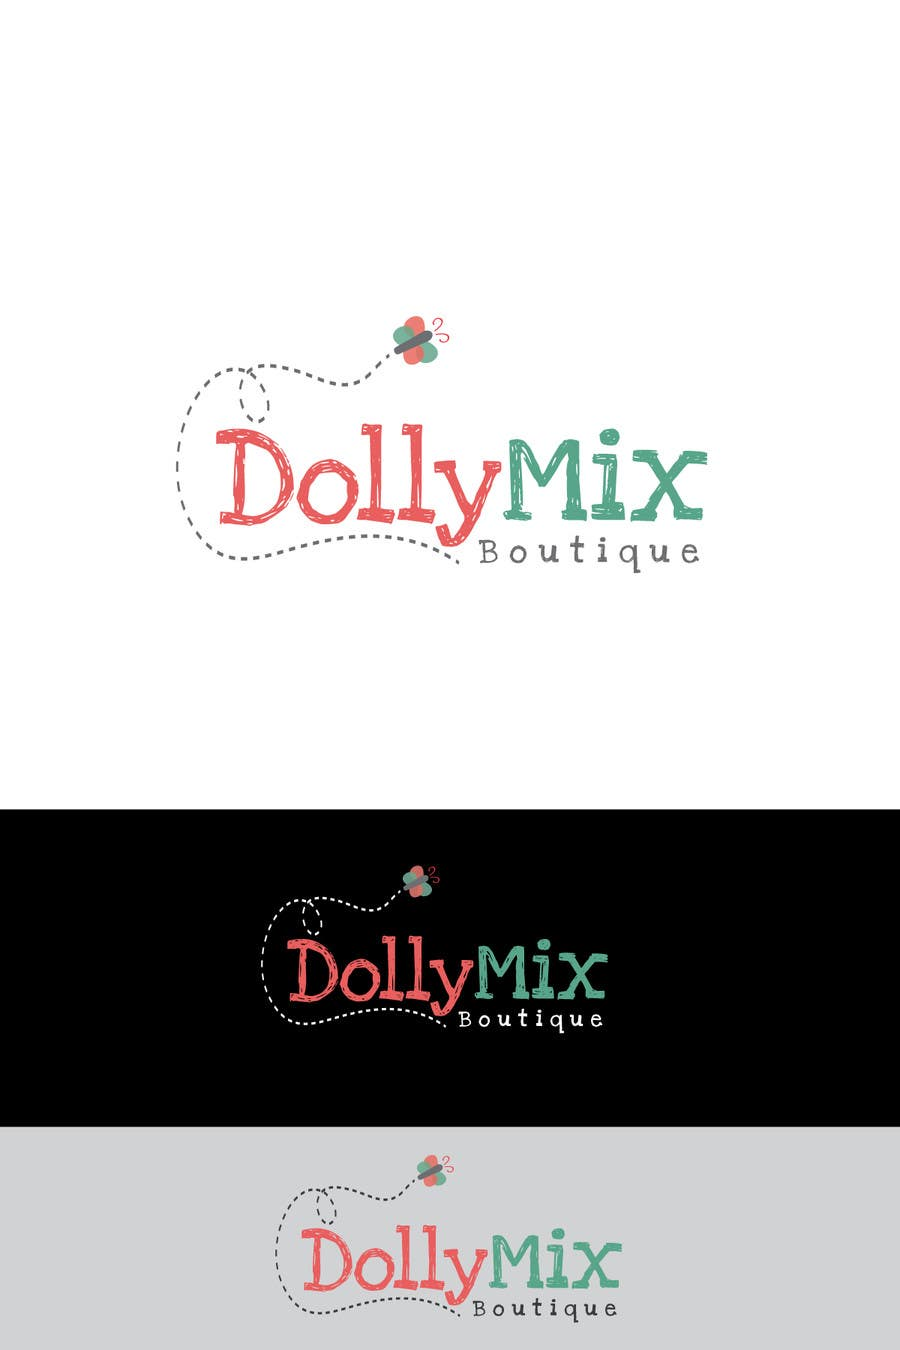 Penyertaan Peraduan #33 untuk DollyMixBoutique